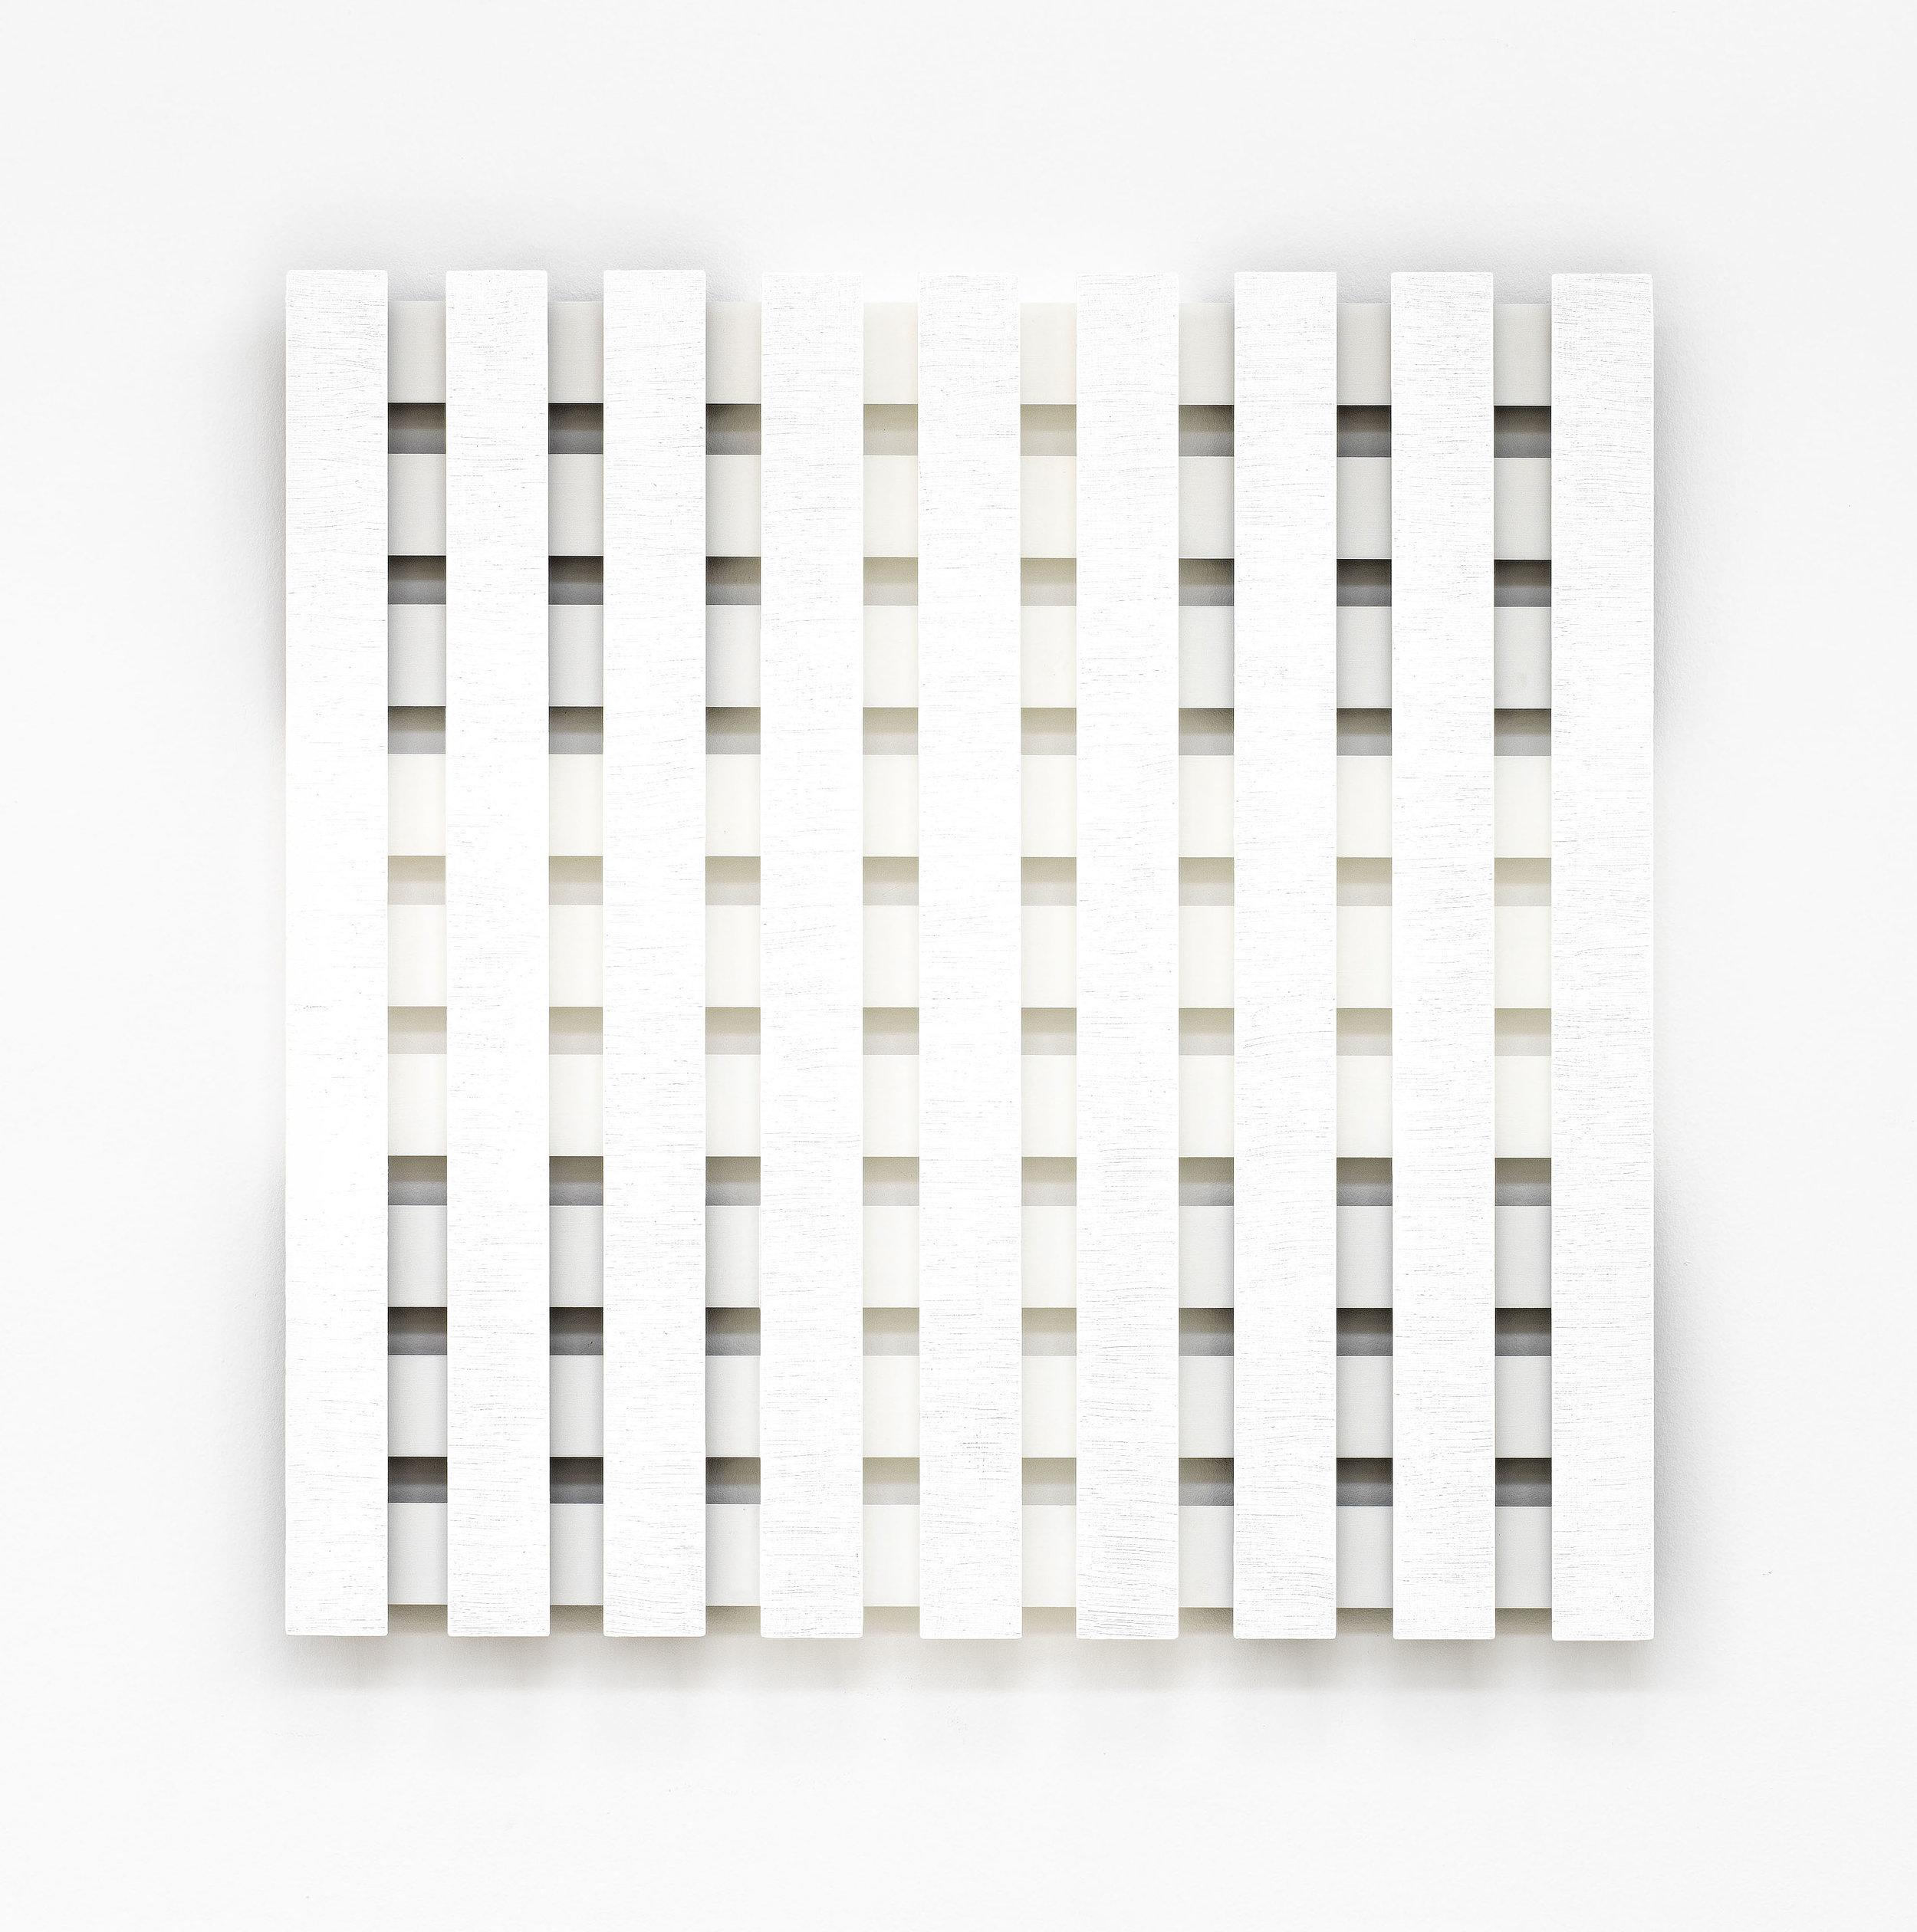 1g akril, les, 121 x 121 cm, 2008.jpg